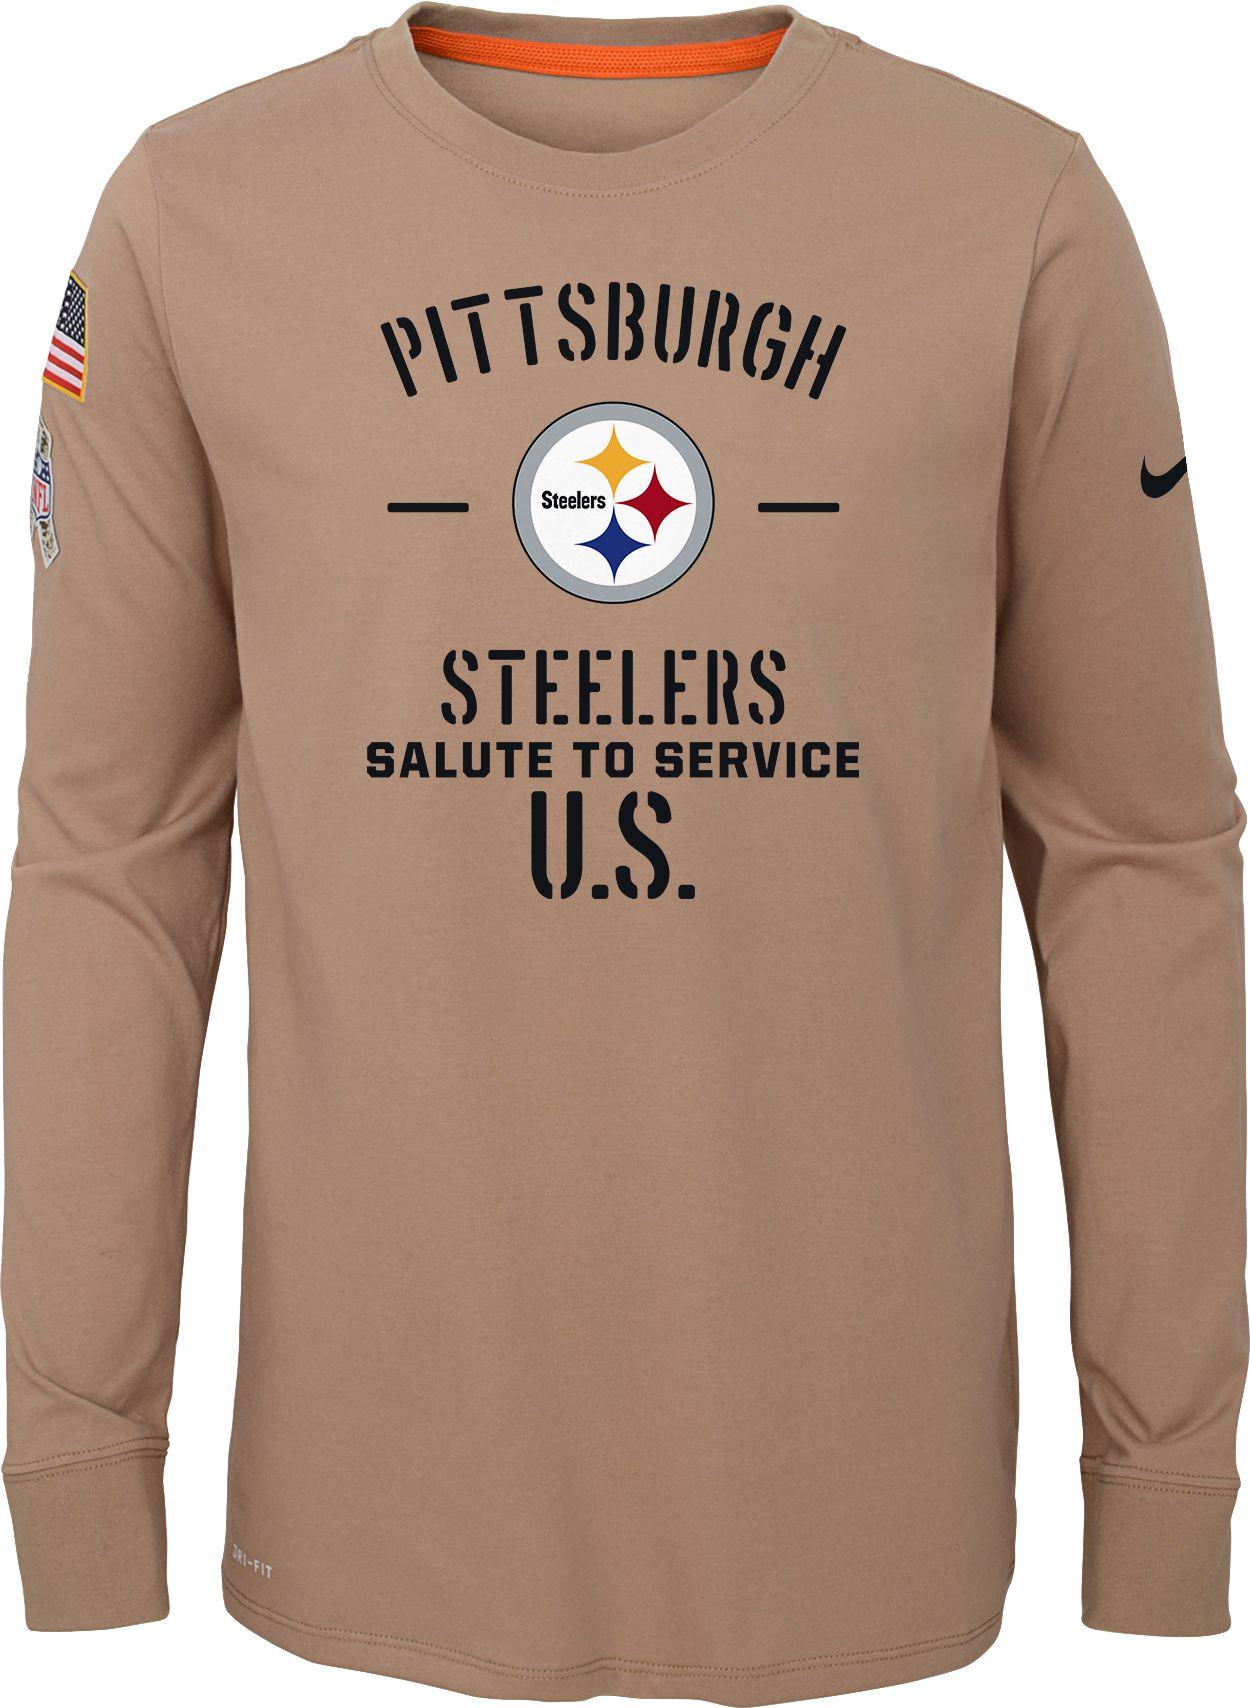 pittsburgh steelers long sleeve shirt